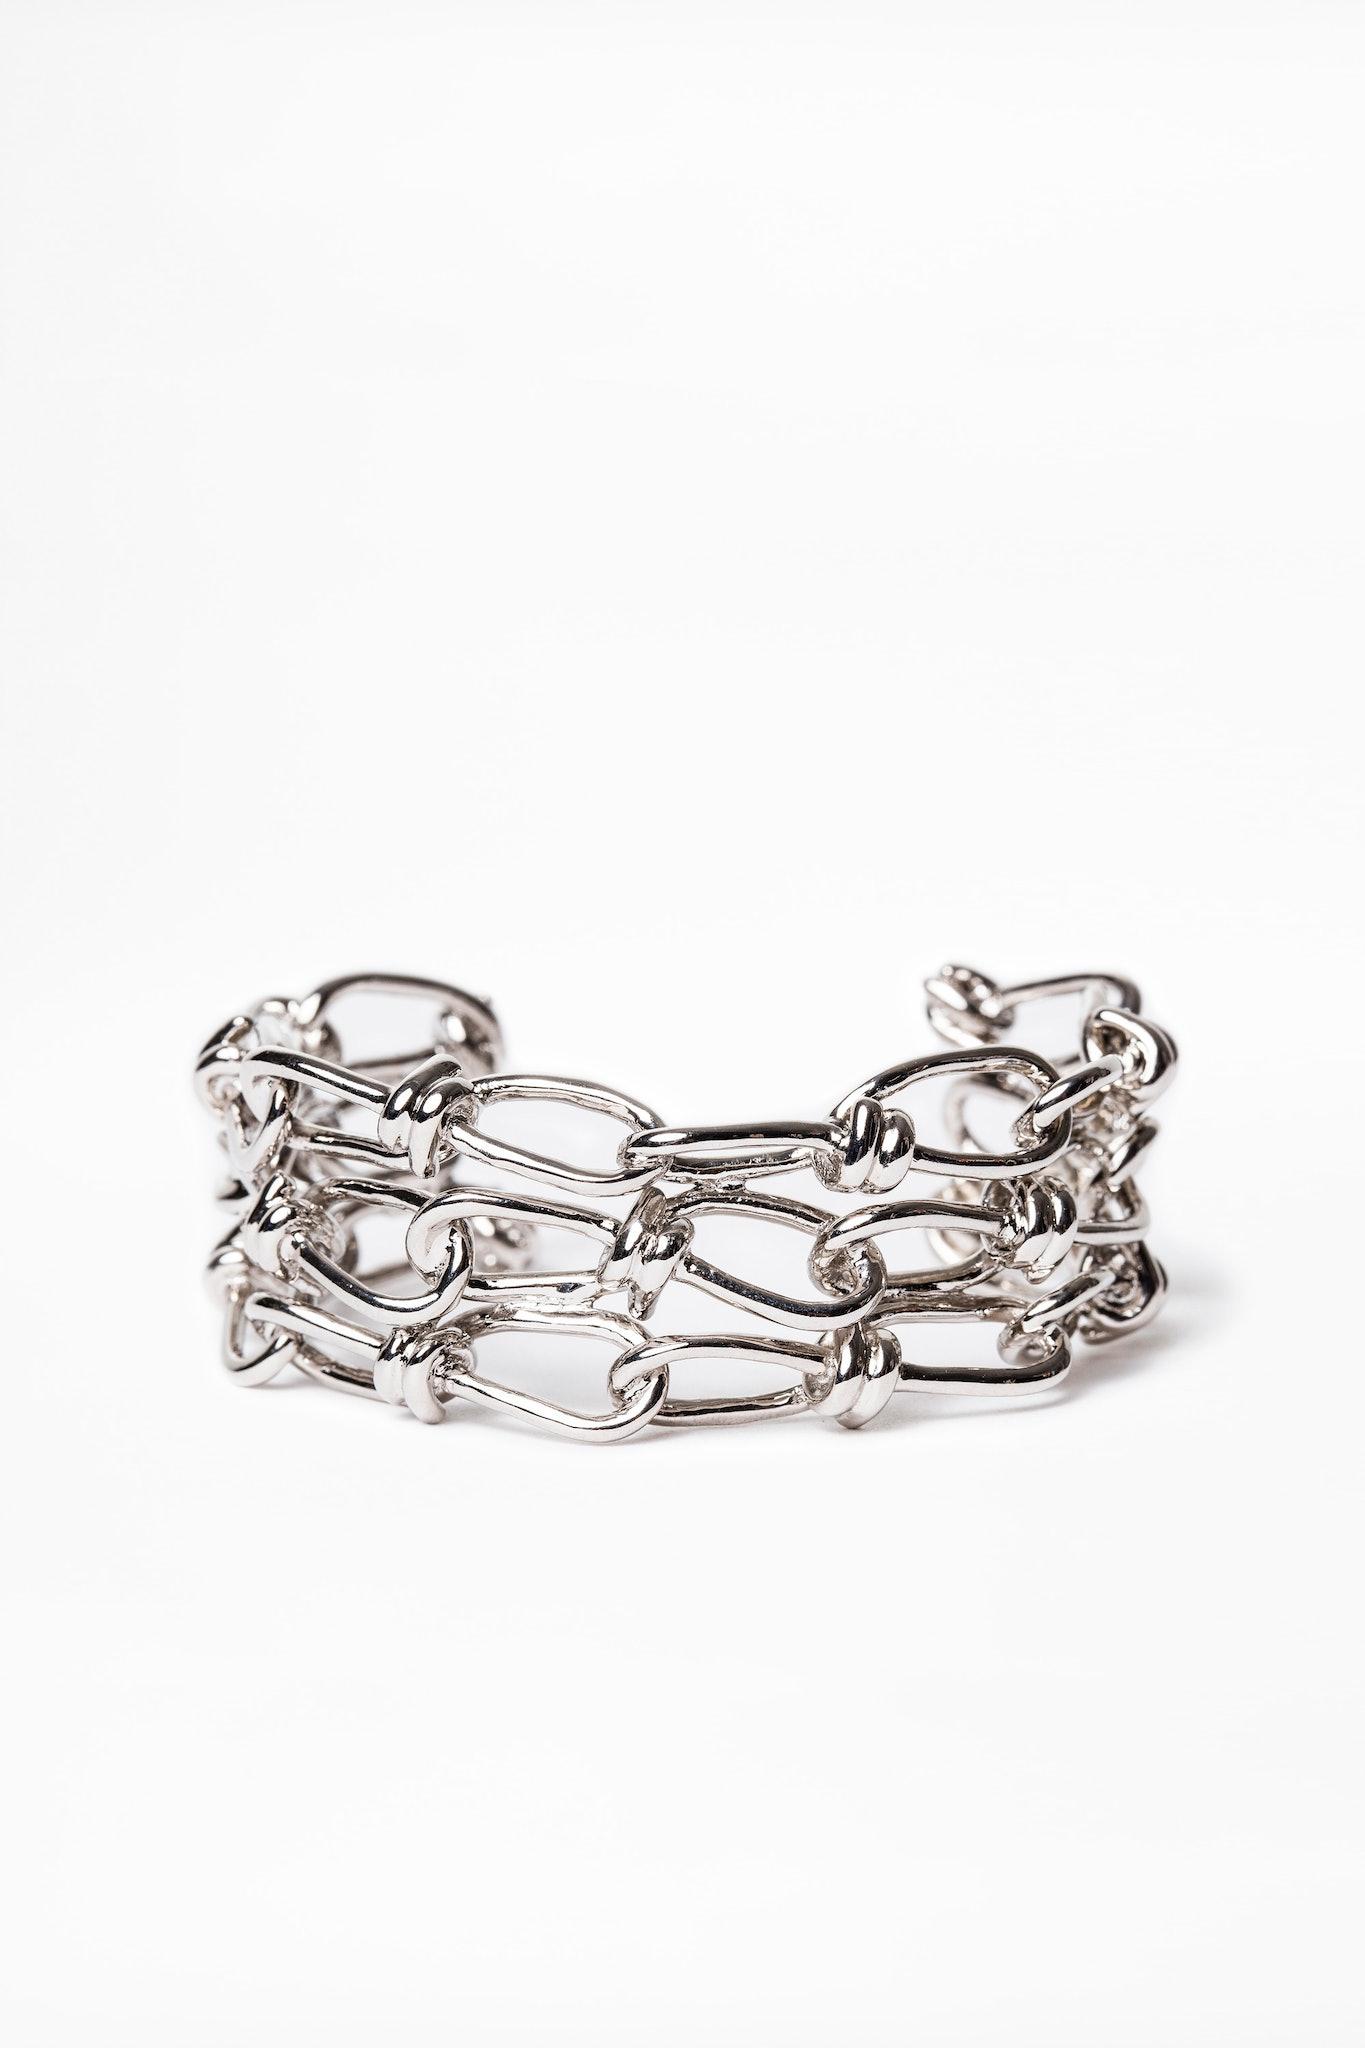 Zadig & Voltaire x AnneLise Michelson Bracelet